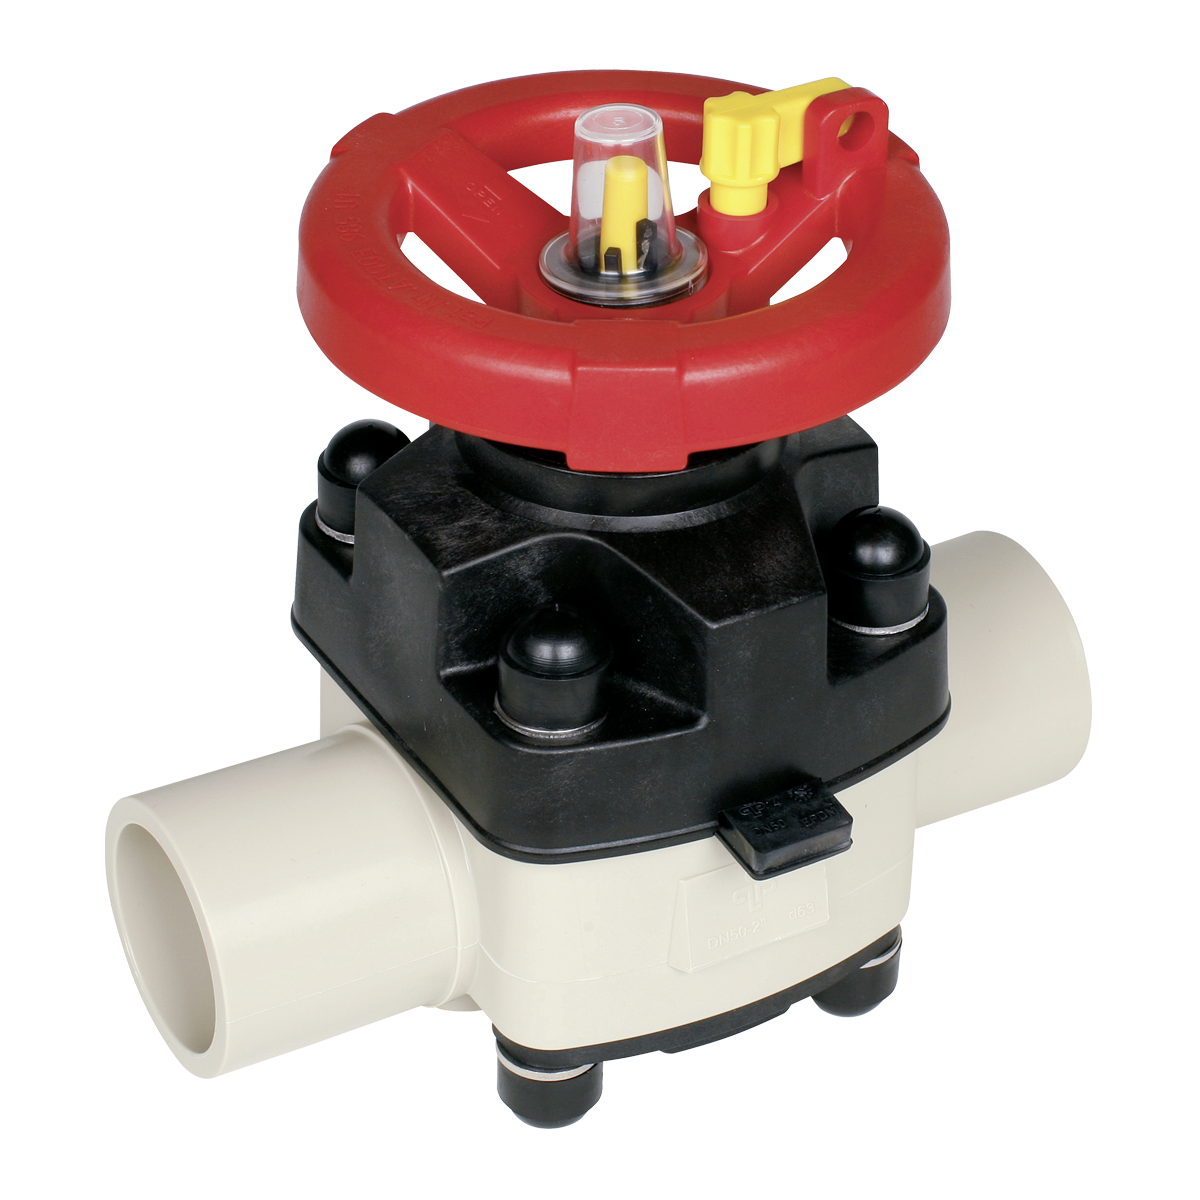 Praher diaphragm valve T4 PP with spigot, beige, black, red